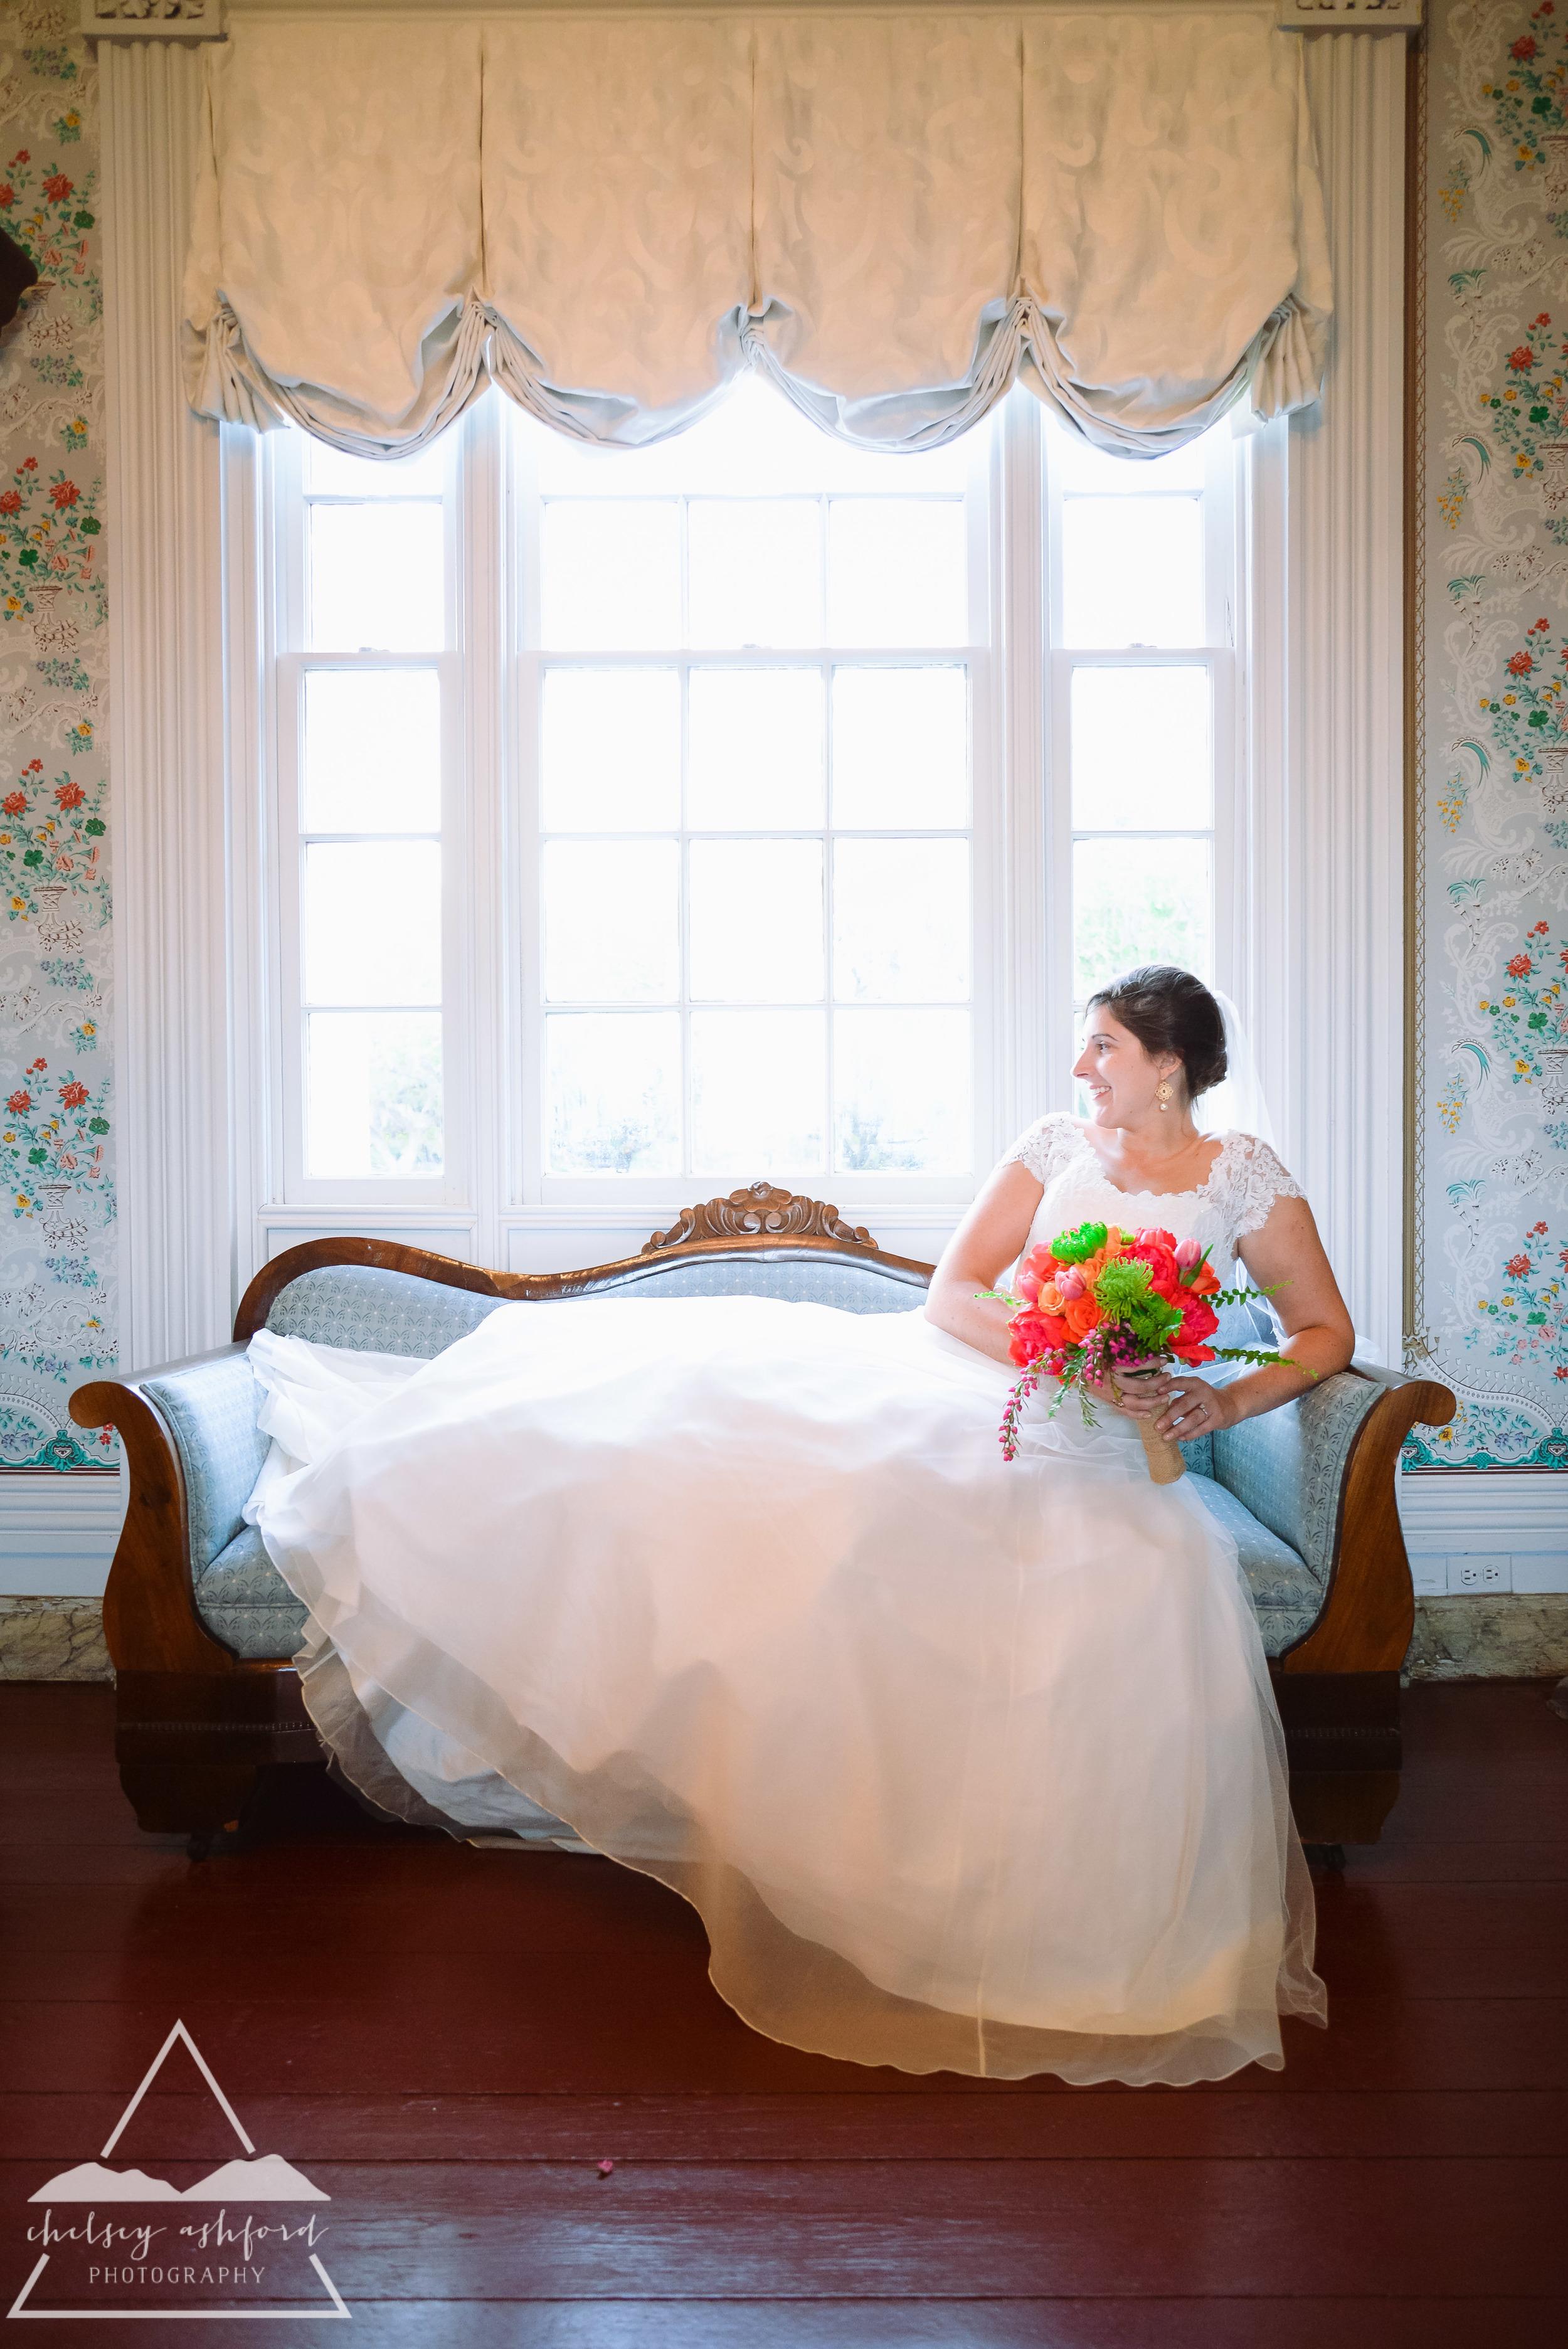 Sylvia_bridals_web-60.jpg